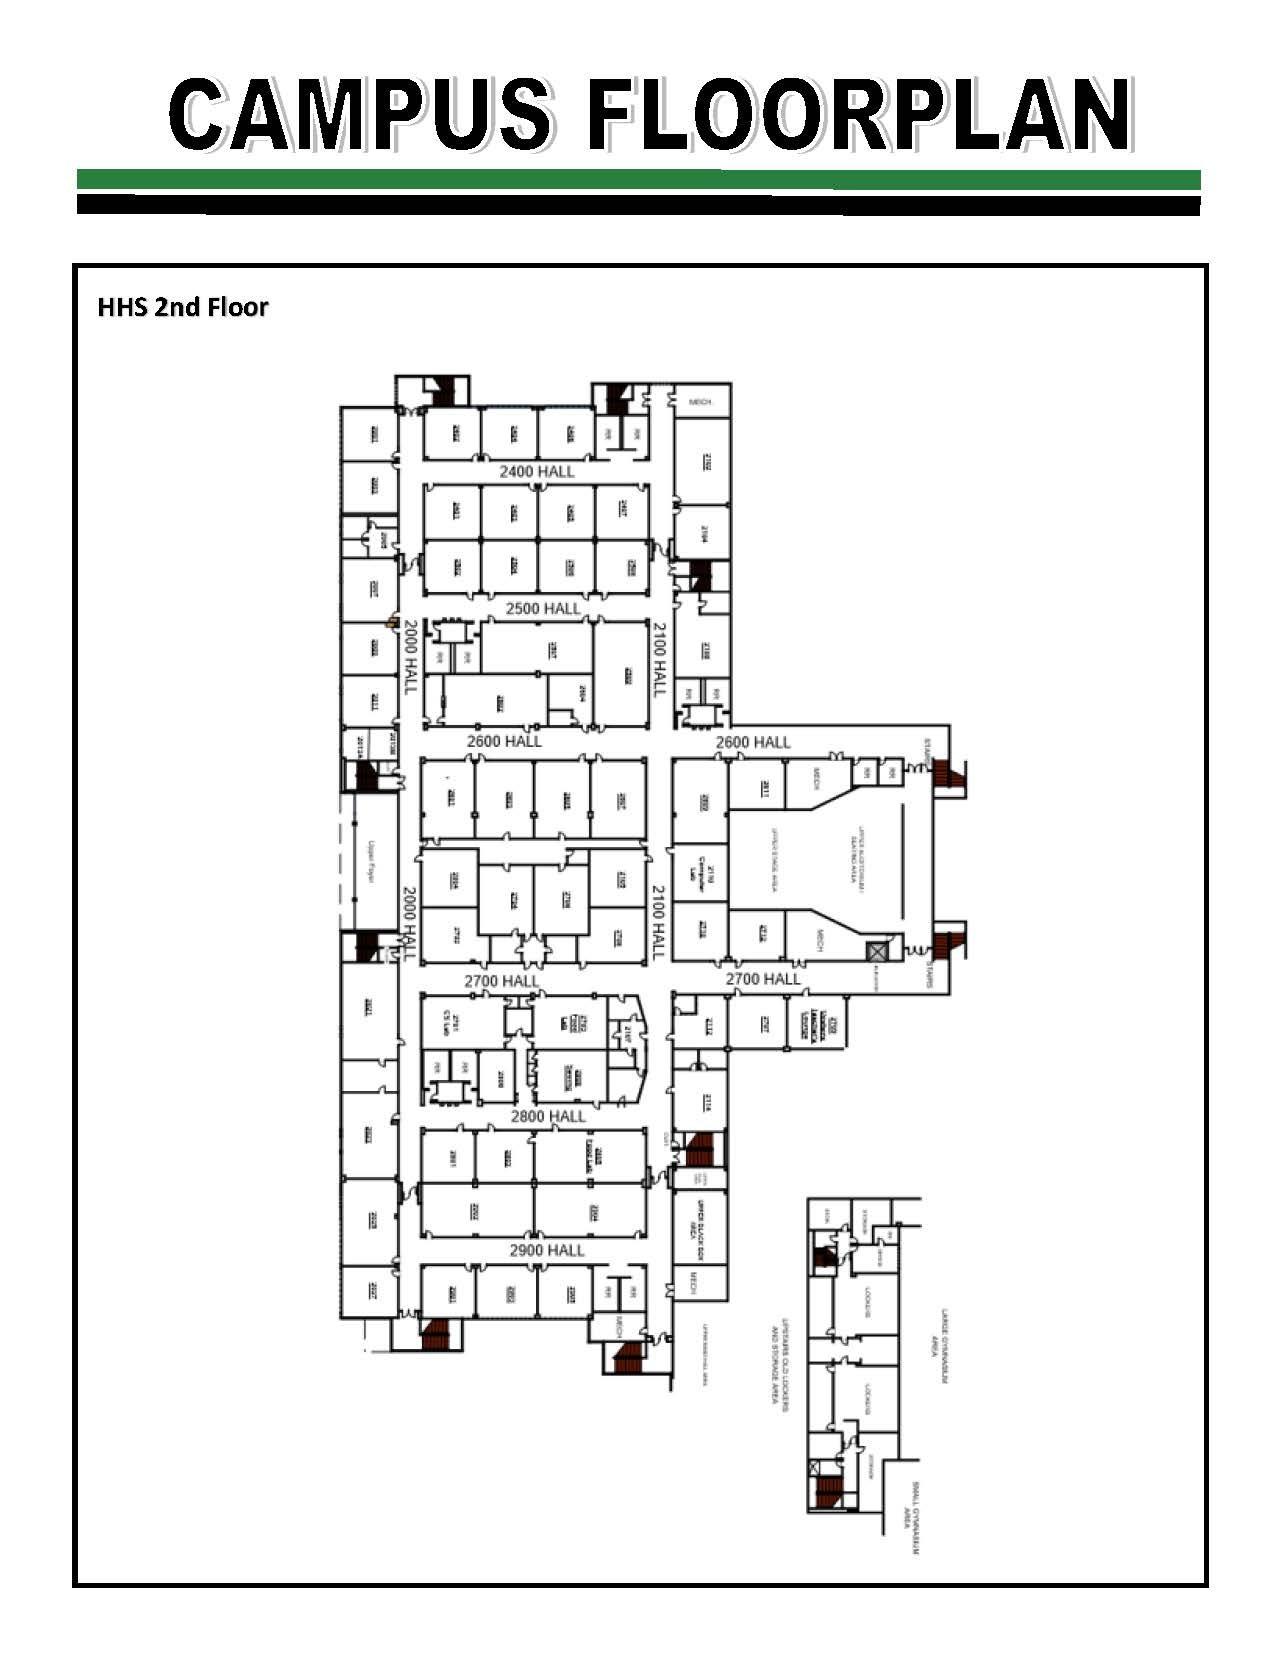 HHS Floorplan 2nd floor